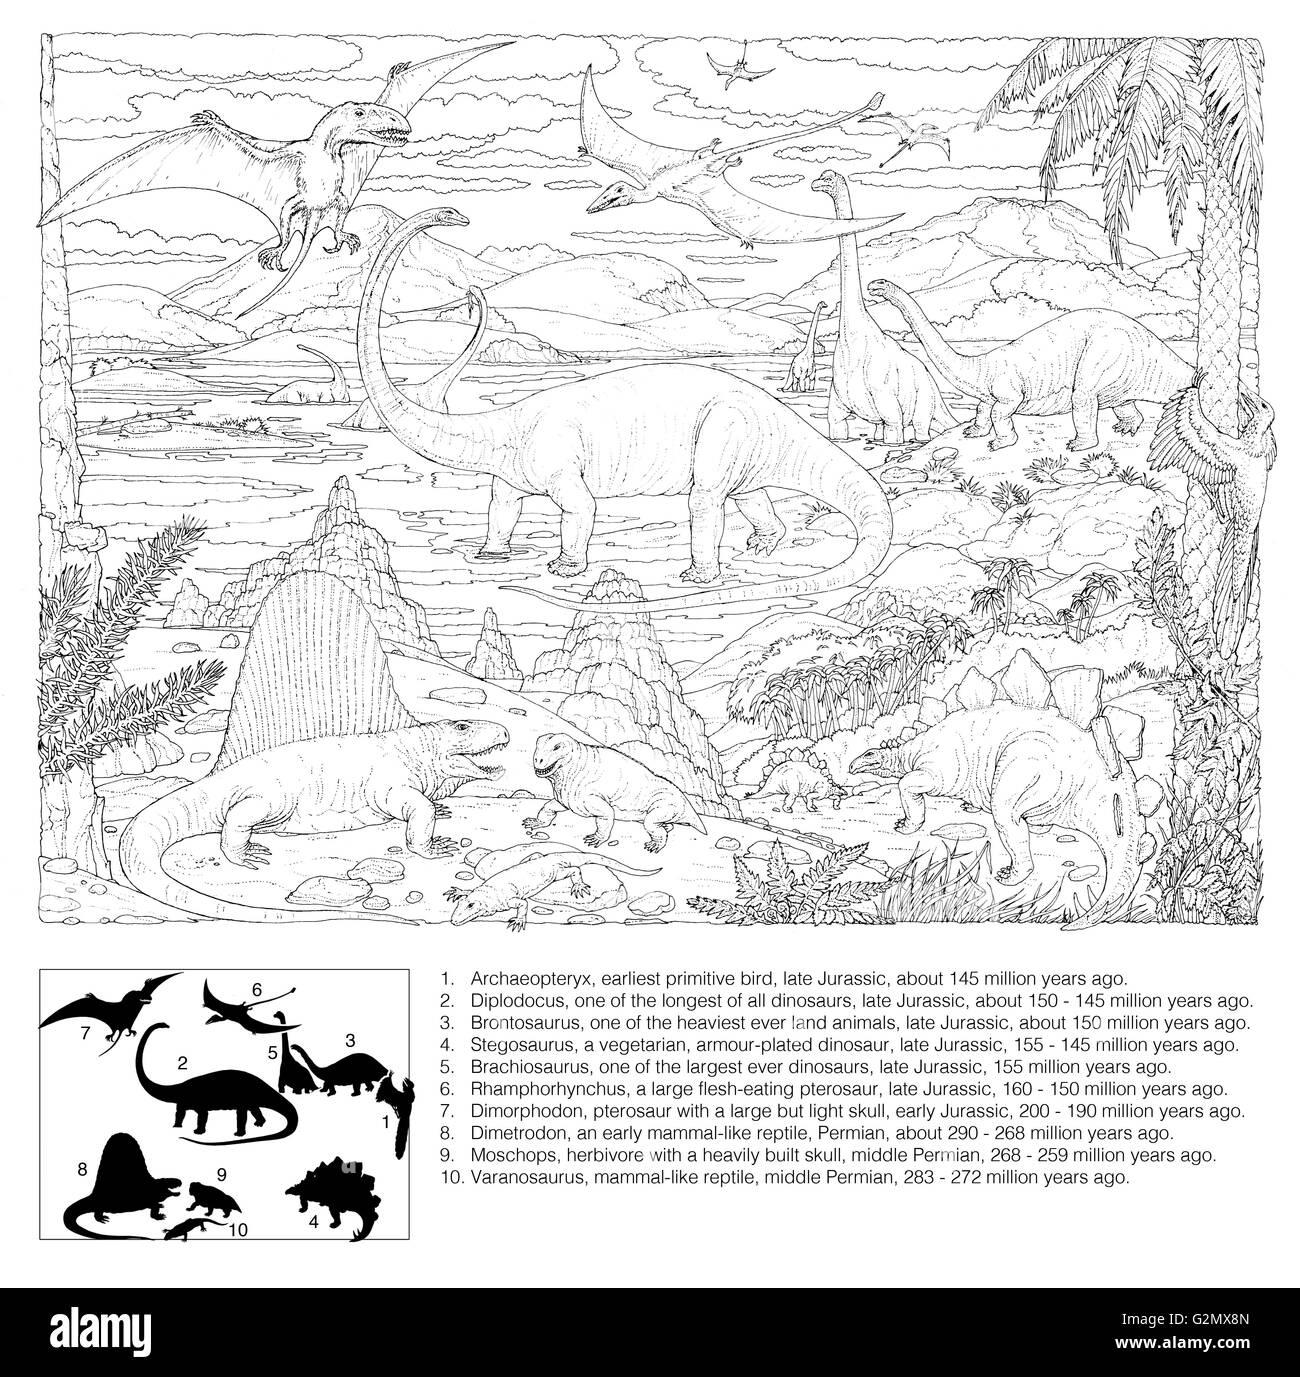 Prehistoric Animal Scene (black on white line drawing), with explanatory key. - Stock Image